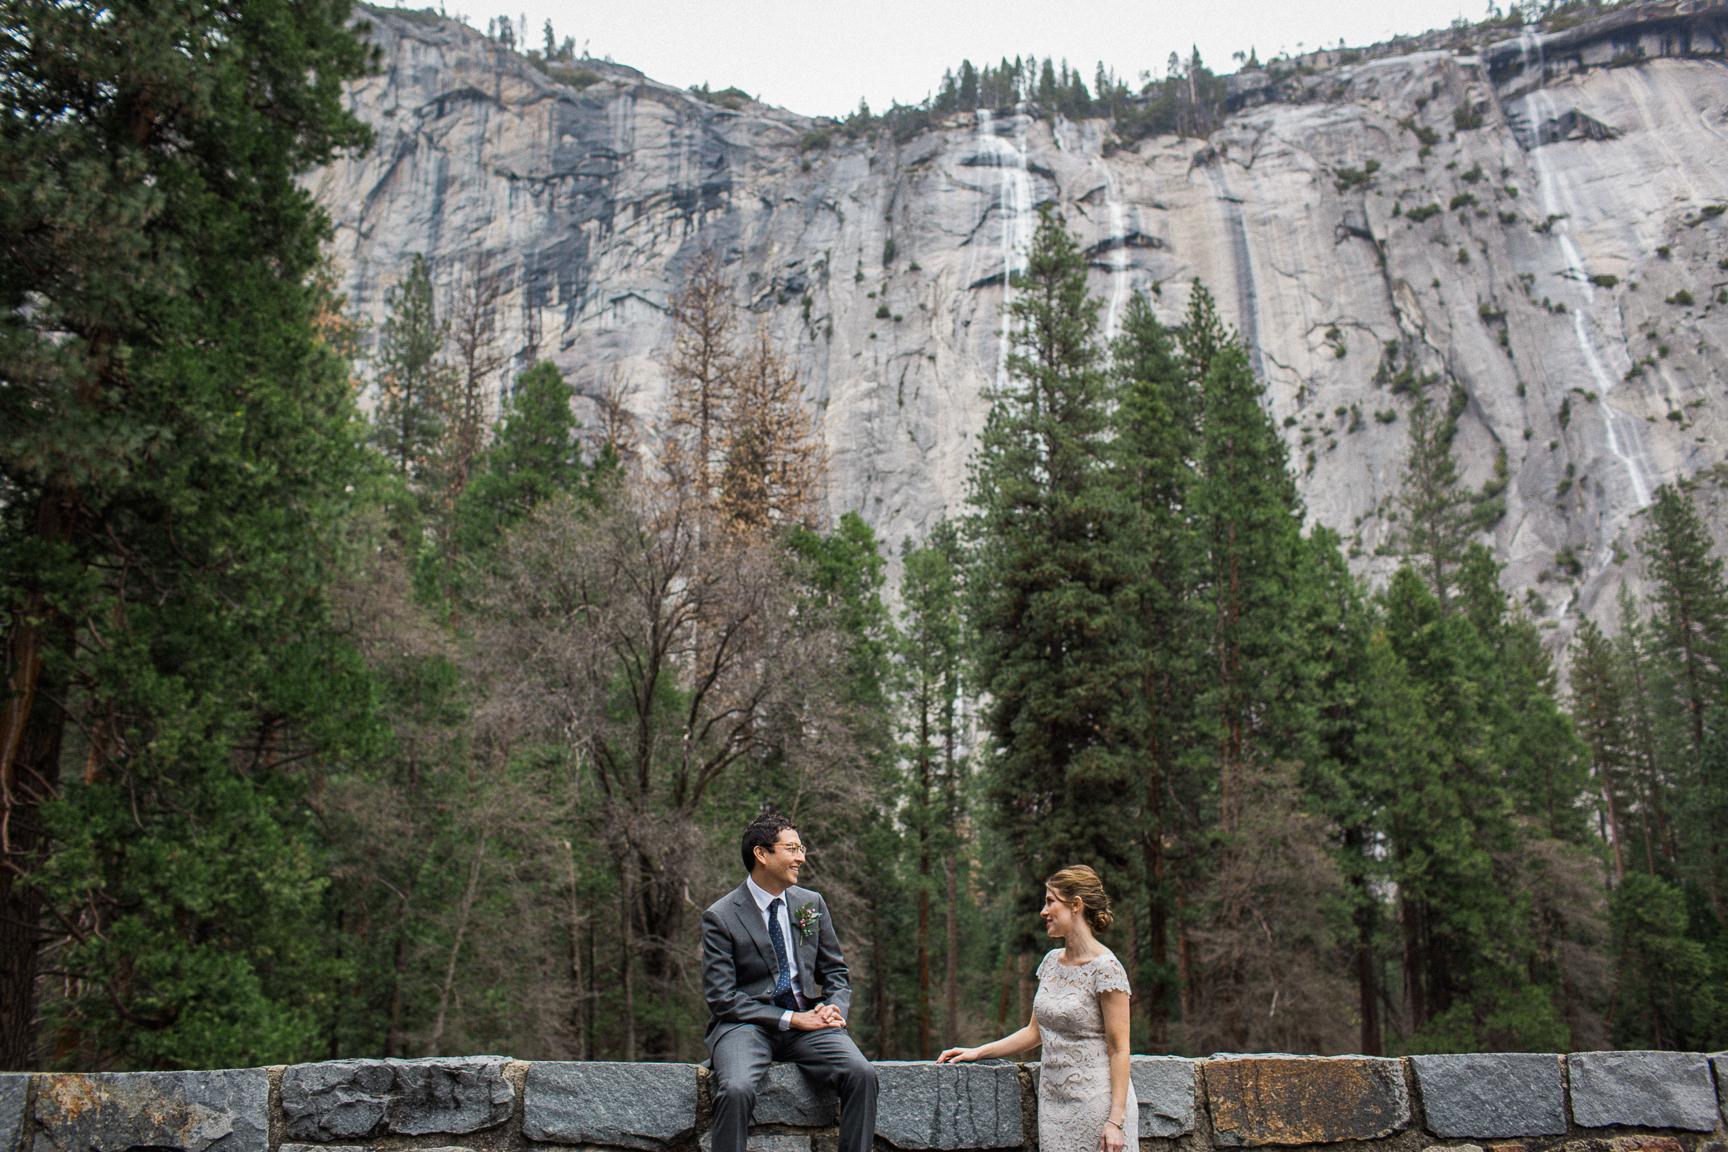 Yosemite-wedding-majestic-yosemite-hotel-maria-villano-photography-4.jpg